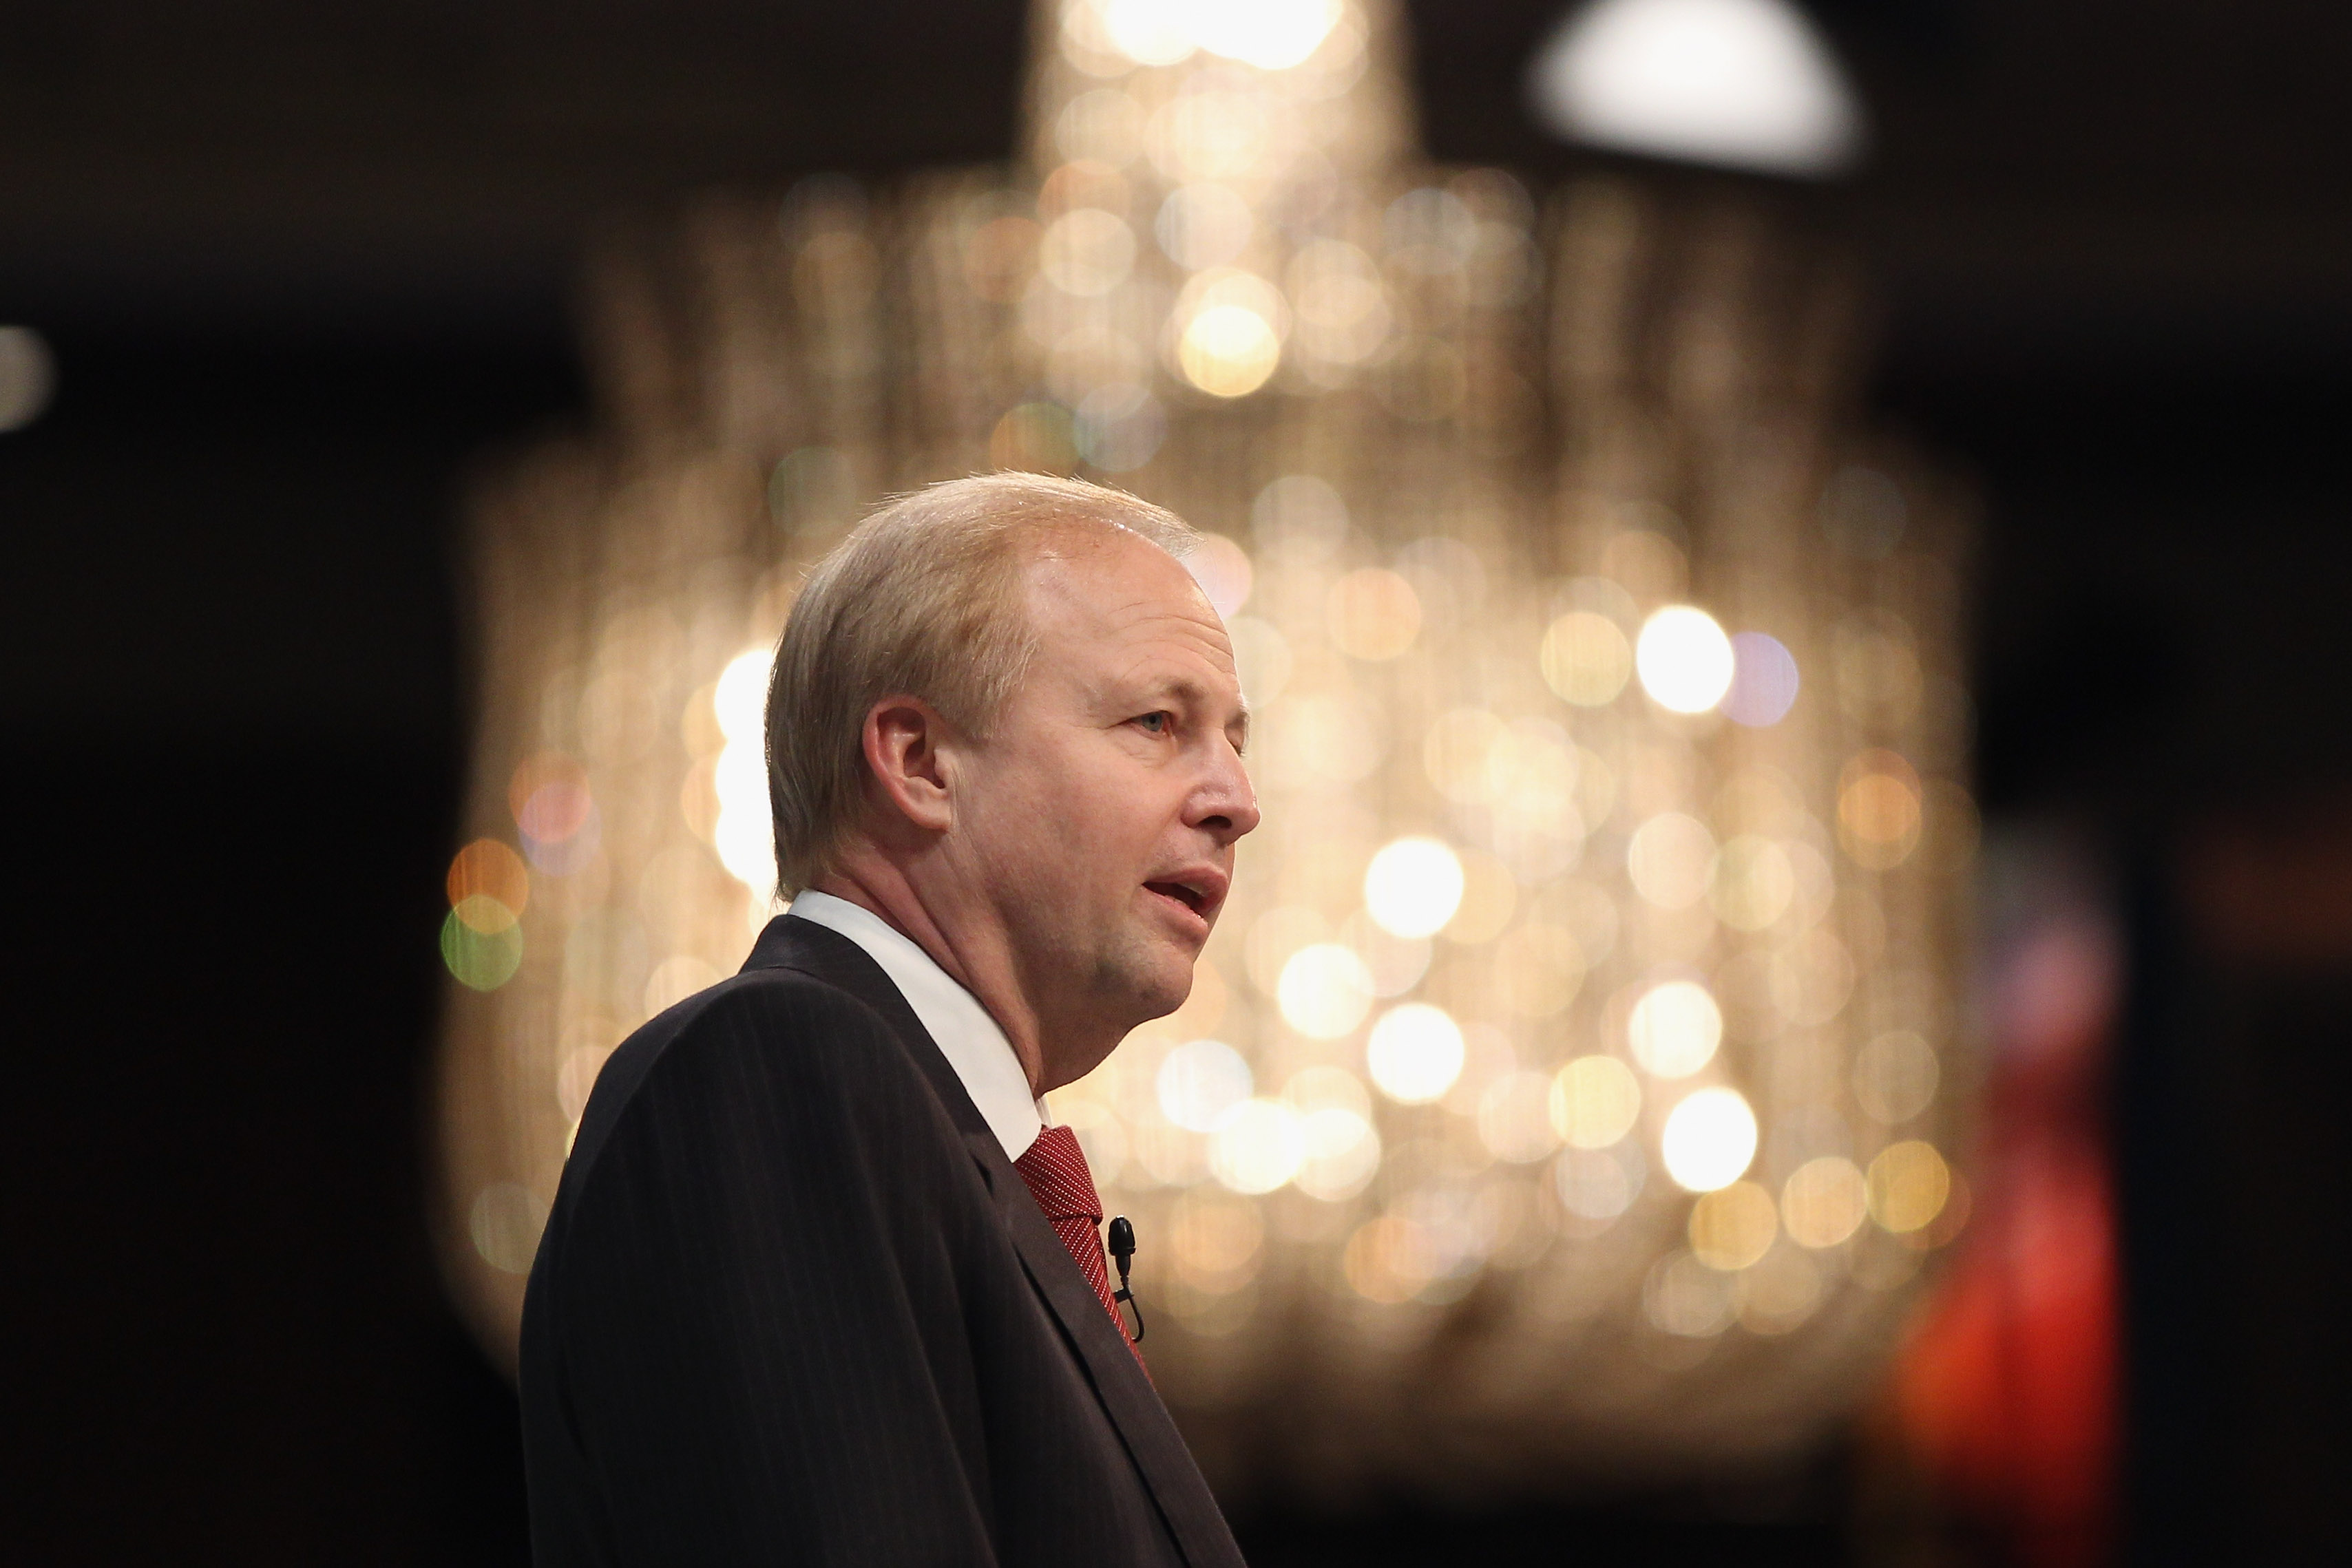 BP CEO Bob Dudley to retire,  Upstream boss Bernard Looney named successor